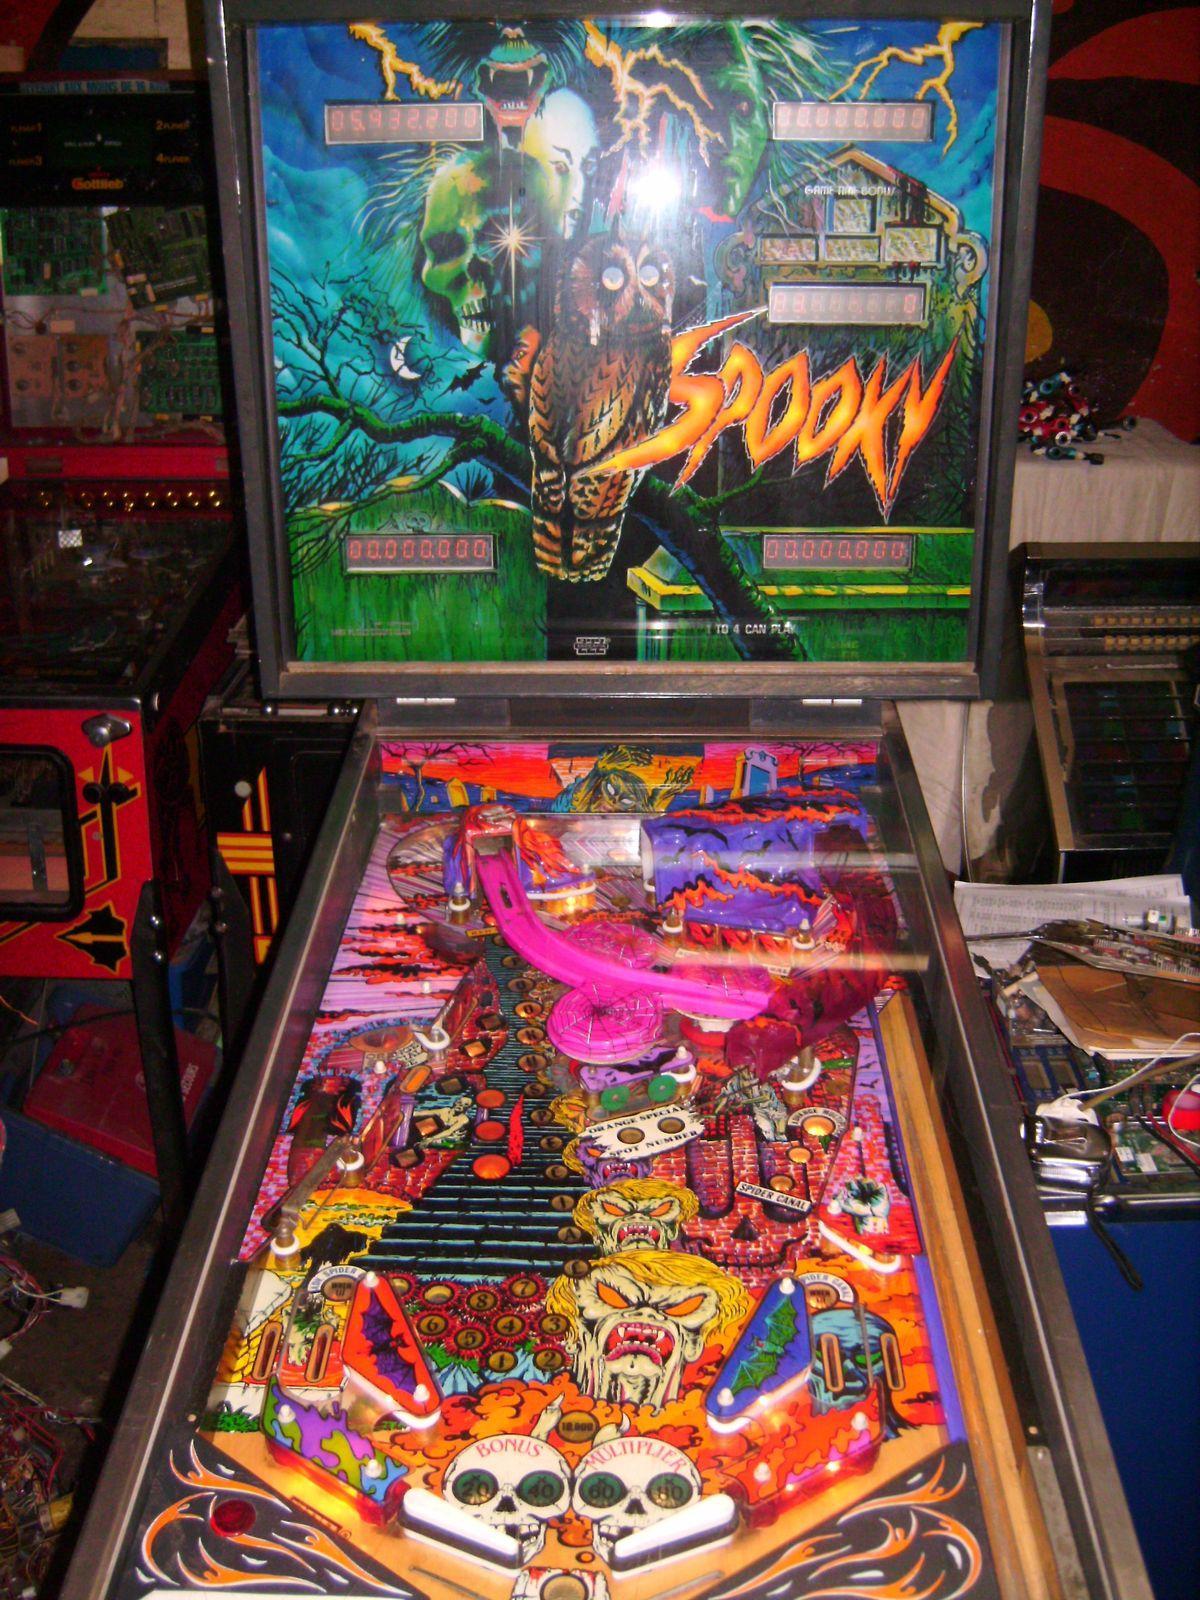 Zaccaria Spooky pinball machine 1987 coin operated arcade game